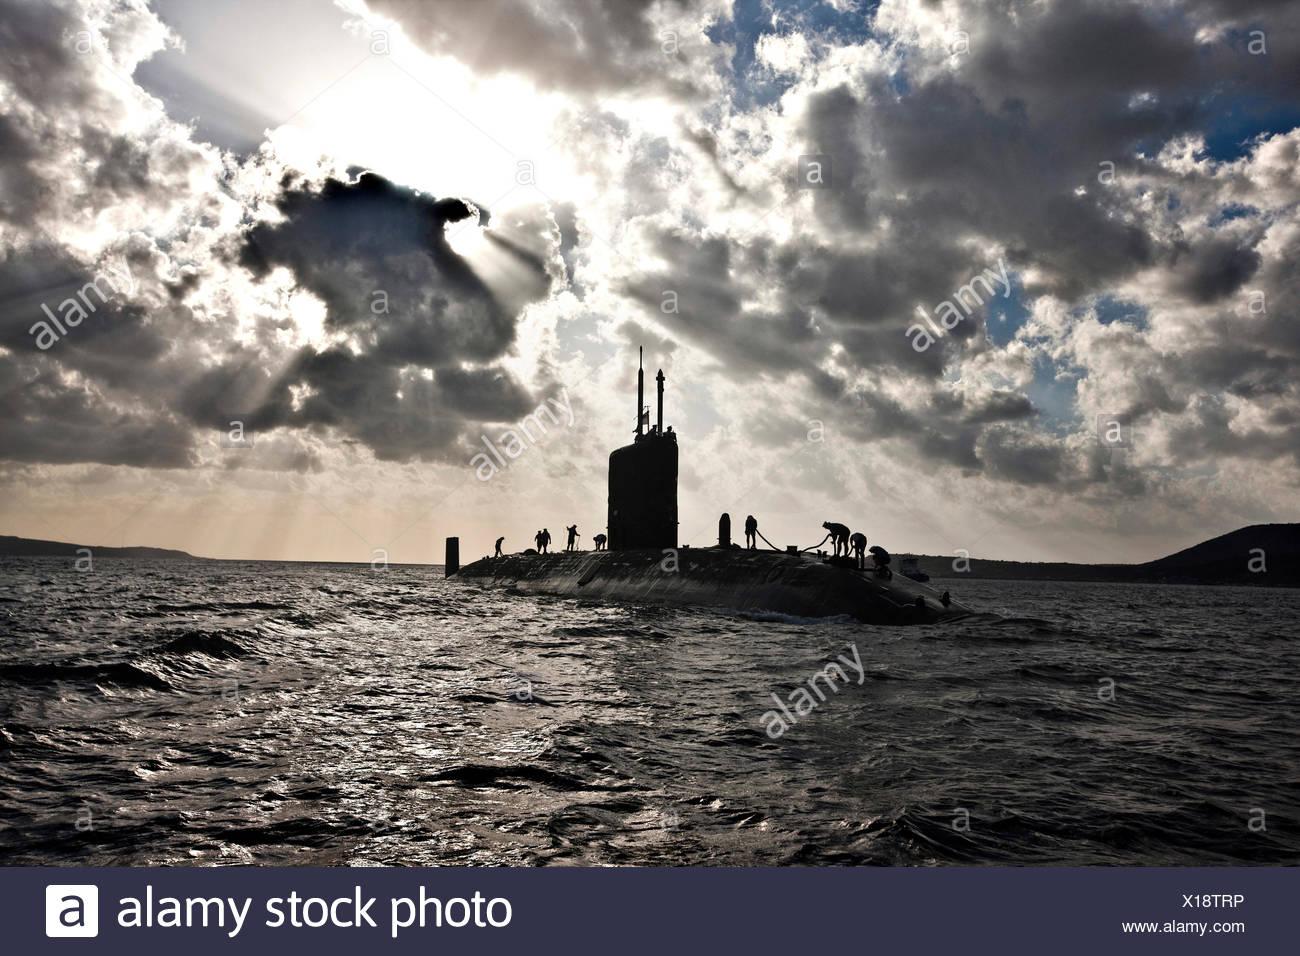 Submarino nuclear HMS Talent y tripulación, retroiluminado en Egipto Imagen De Stock